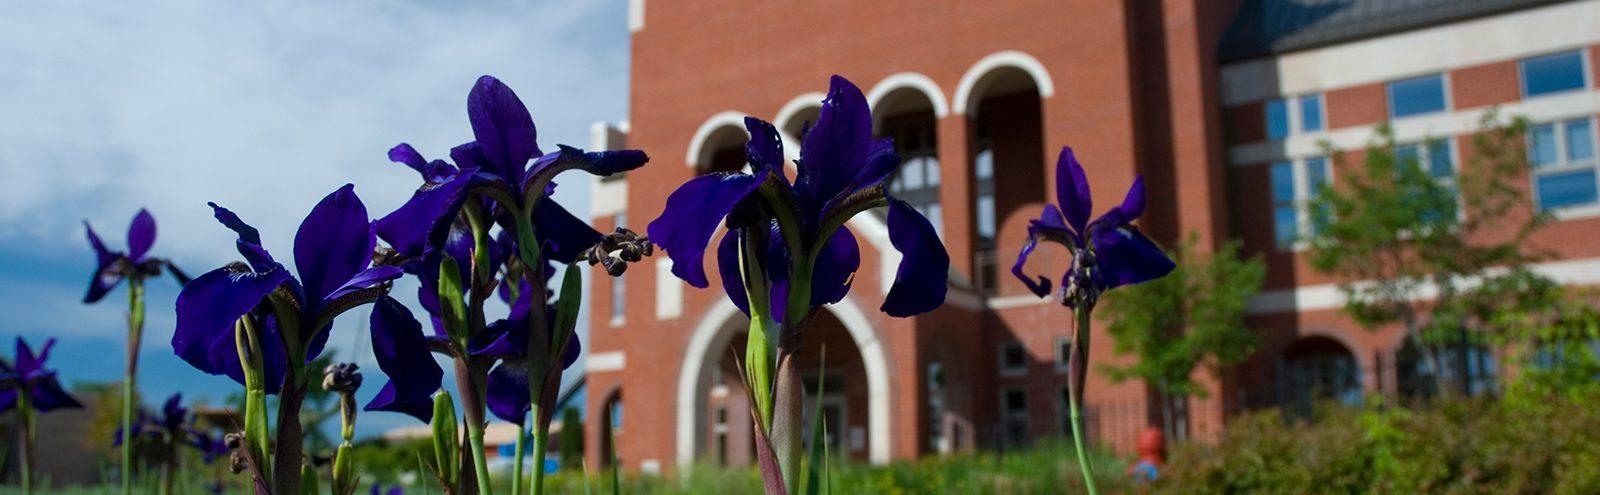 Tulips outside of Ponzio Campus Center